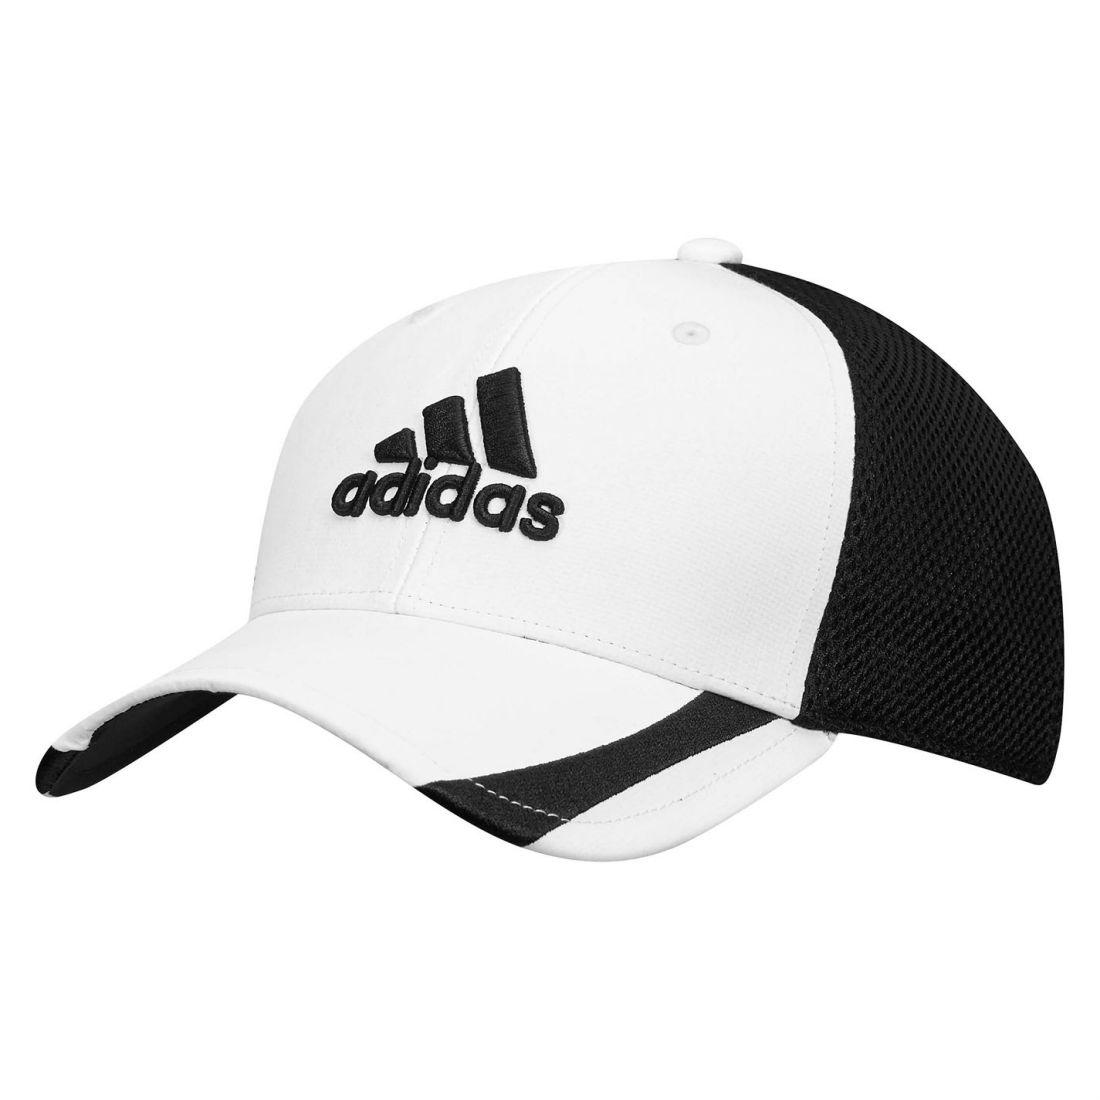 cd2c32eeed3 adidas Mens Tour RDR Cap Golf Breathable Mesh Stretch Breathability ...